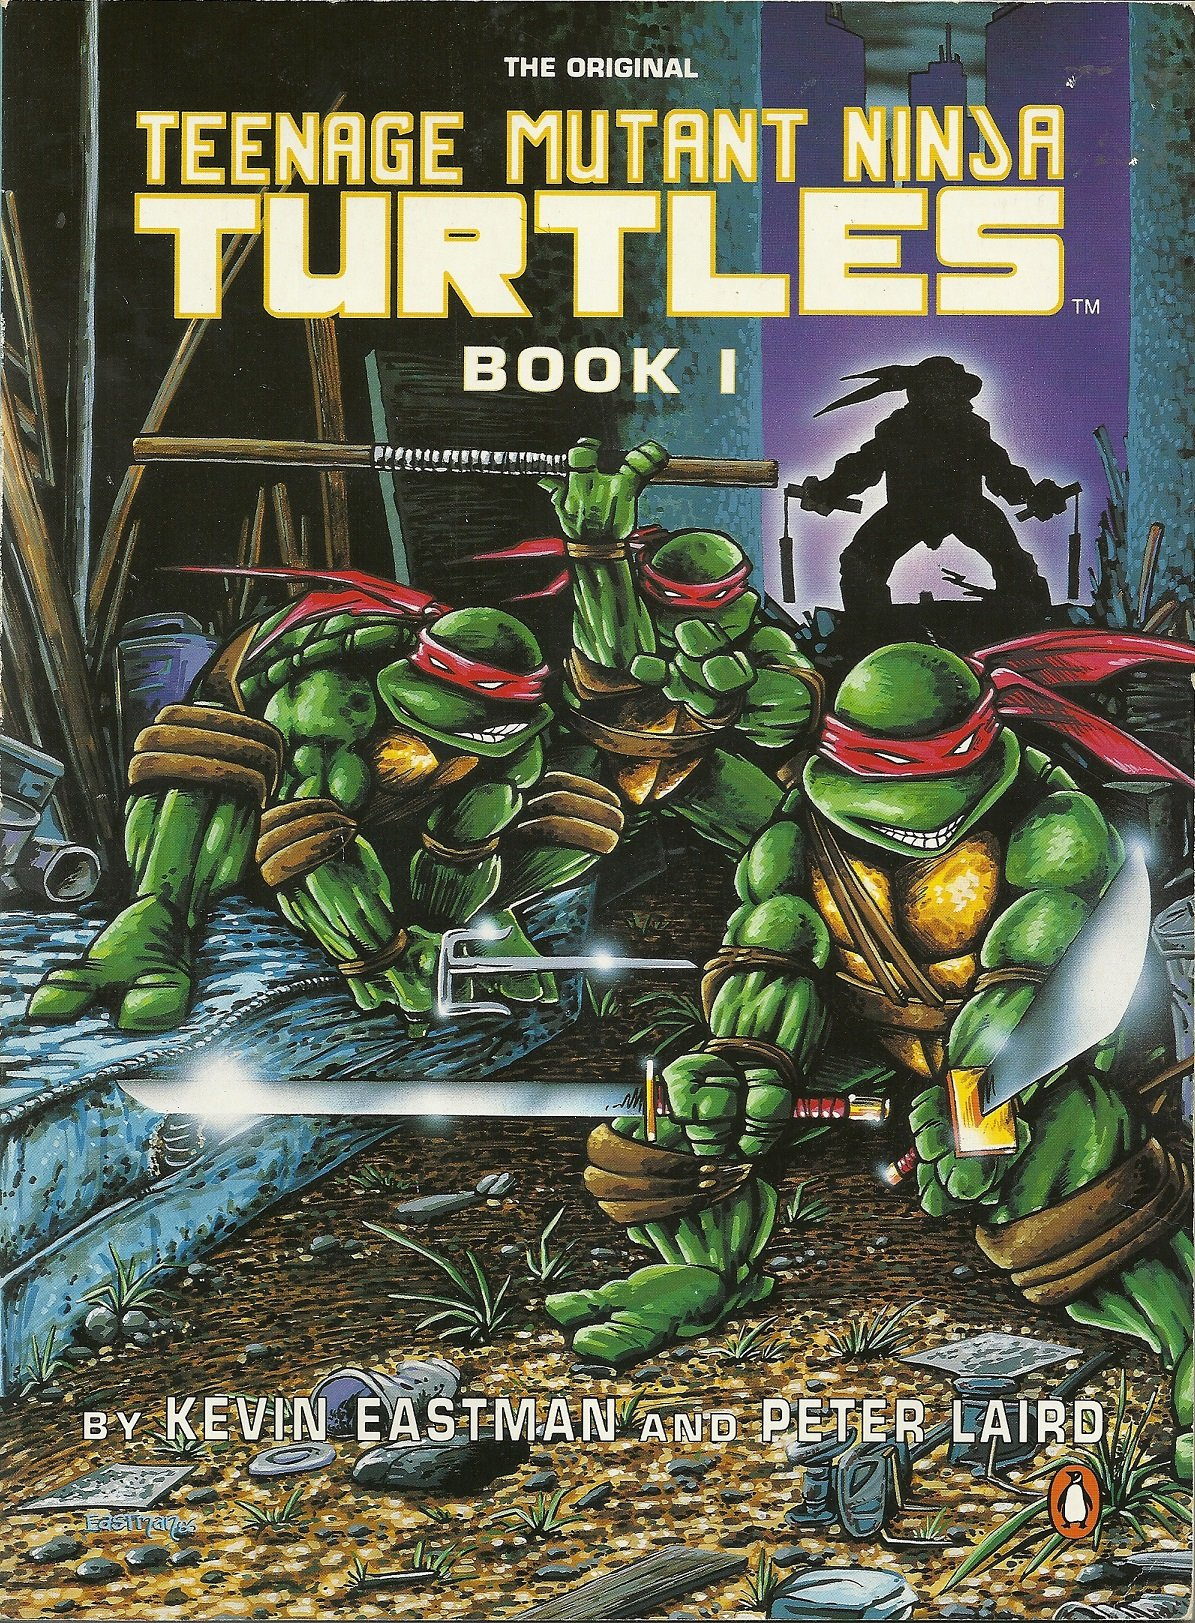 Teenage Mutant Ninja Turtles Book 1: Book I Penguin graphic ...